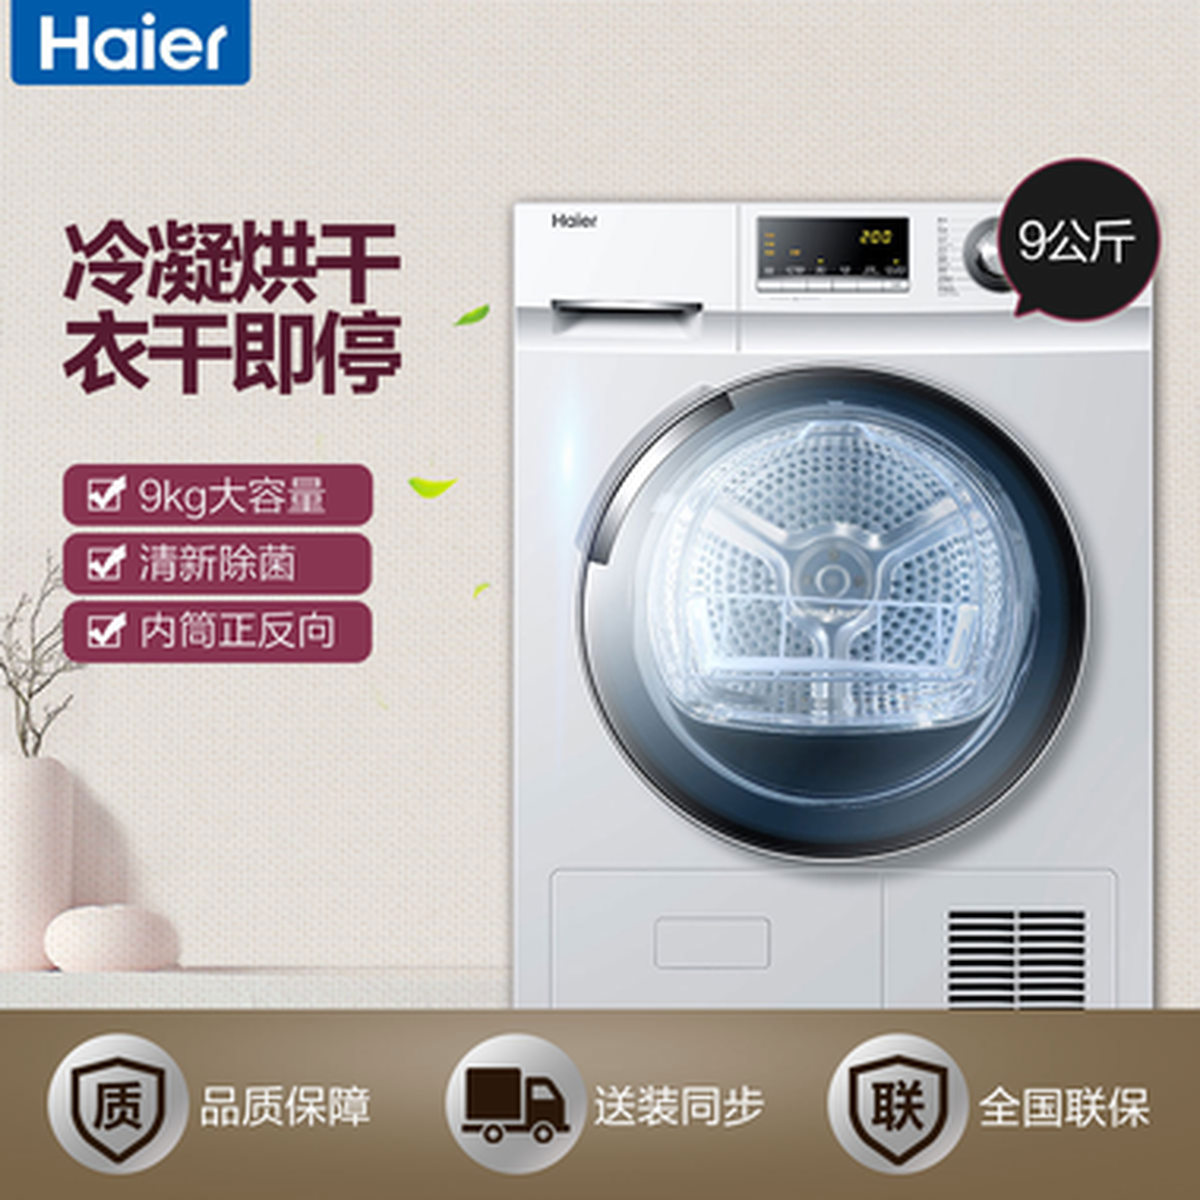 Haier/海尔 干衣机 GDNE9-636